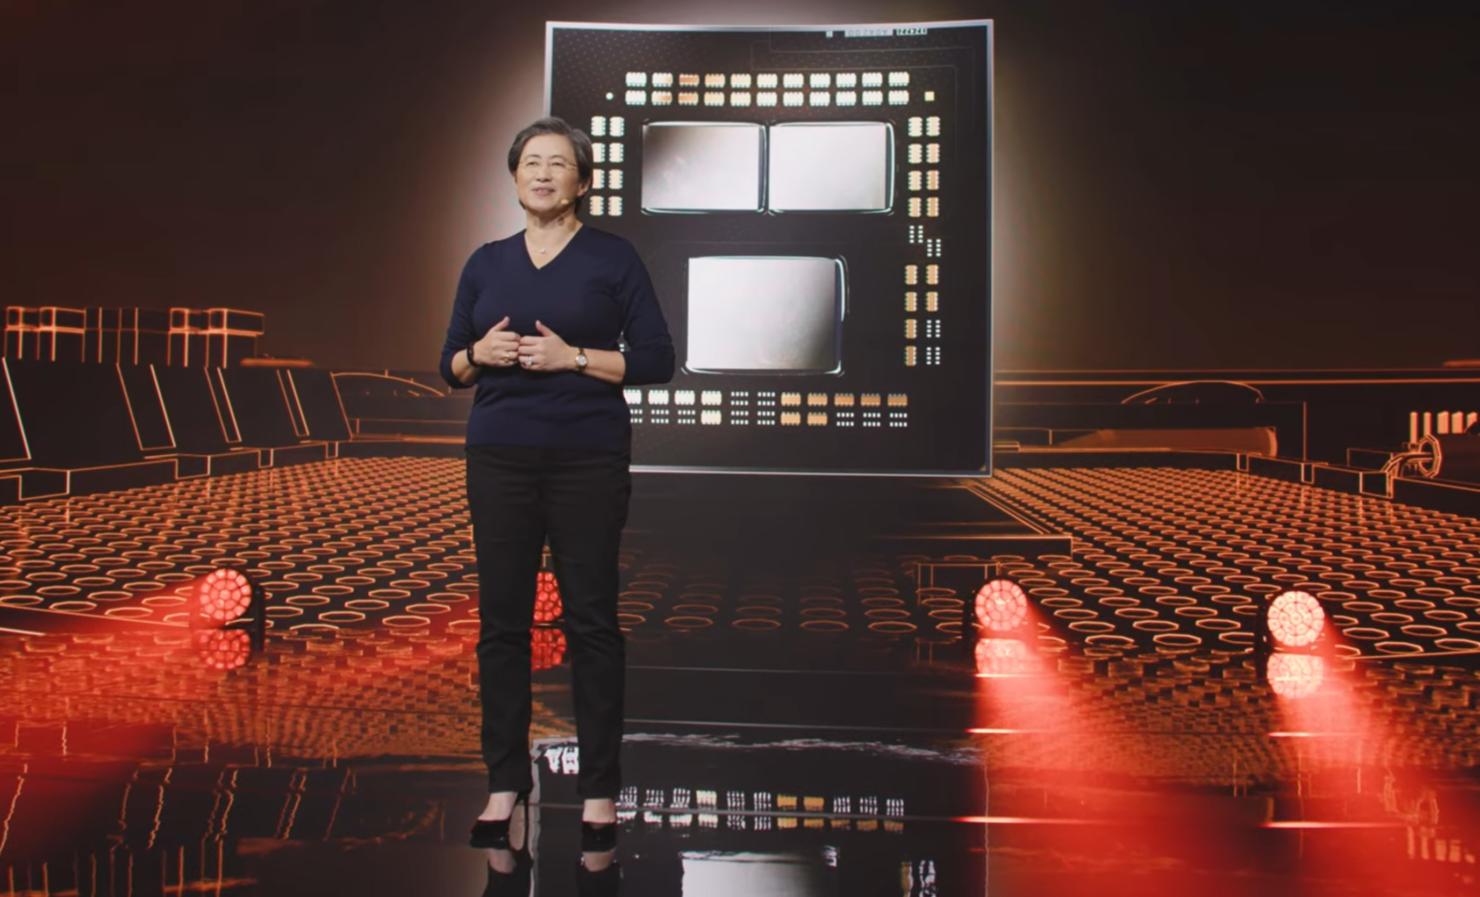 AMD Zen 5 Powered Next-Gen EPYC 'Turin', Ryzen 8000 'Granite Ridge' & Ryzen 8000 'Strix Point' CPUs To Be Produced on TSMC's 3nm Process Node